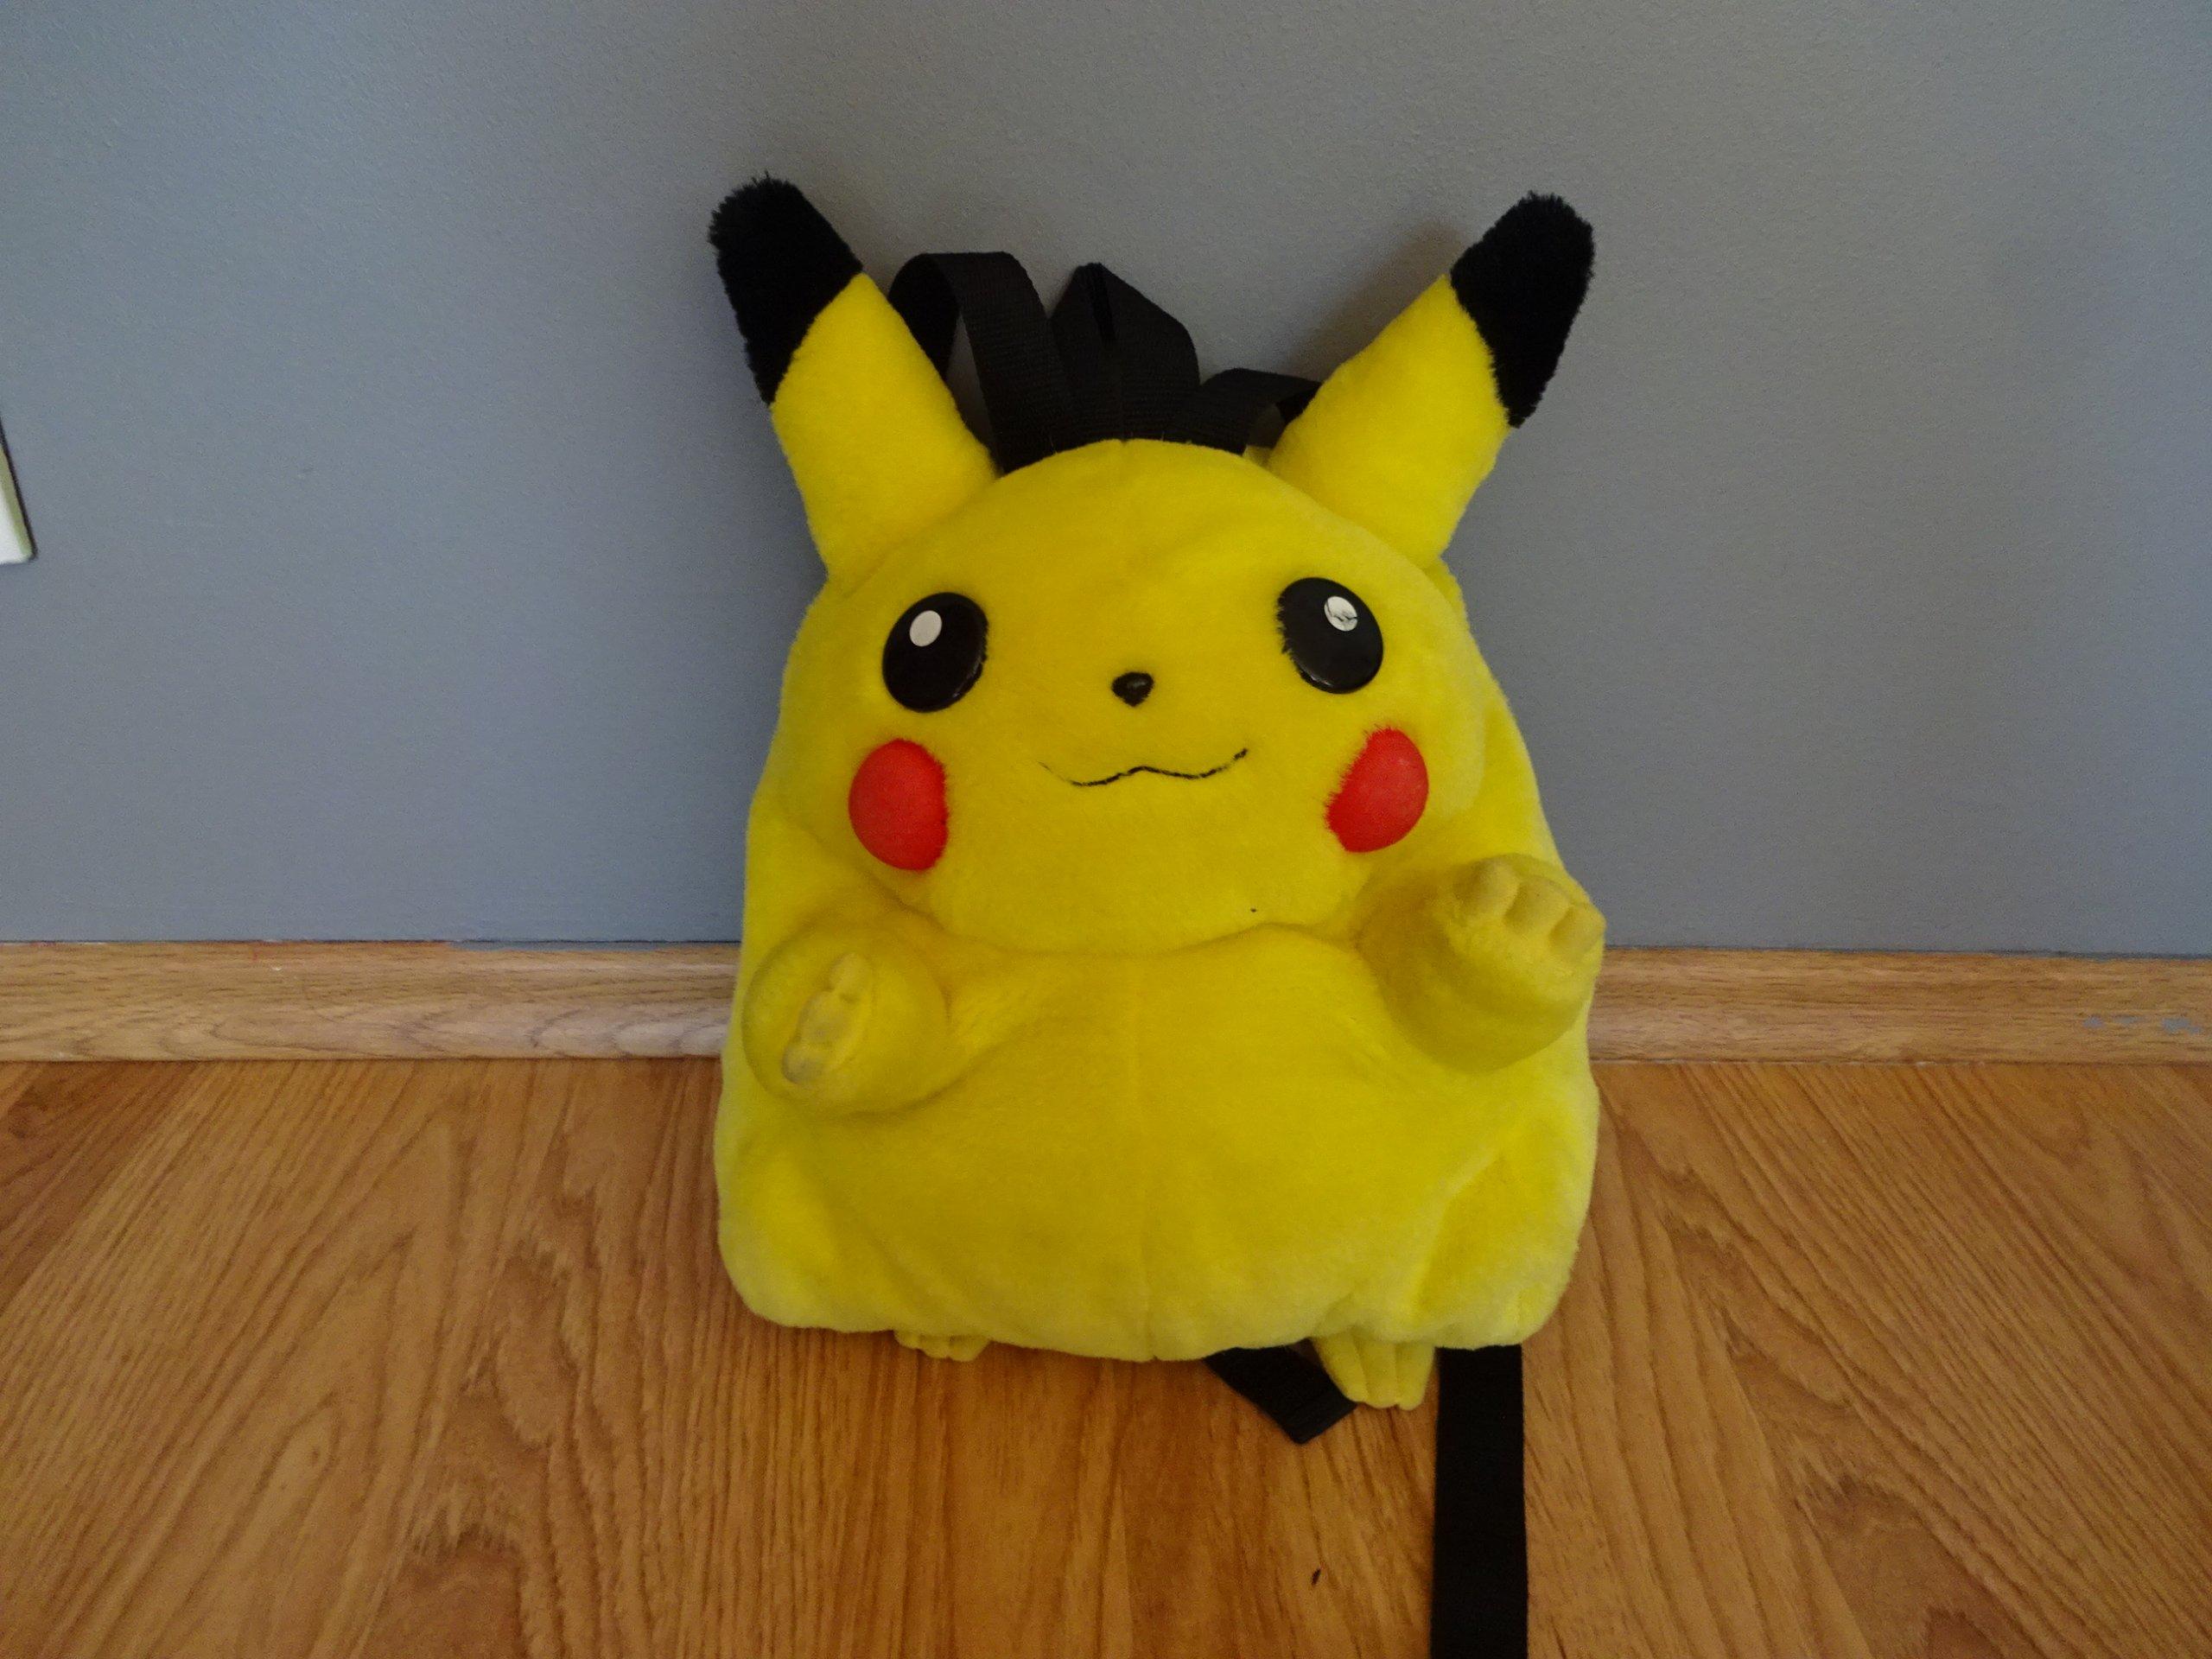 6b0703ccc Plecak Pokemon Pikachu - 7179233205 - oficjalne archiwum allegro